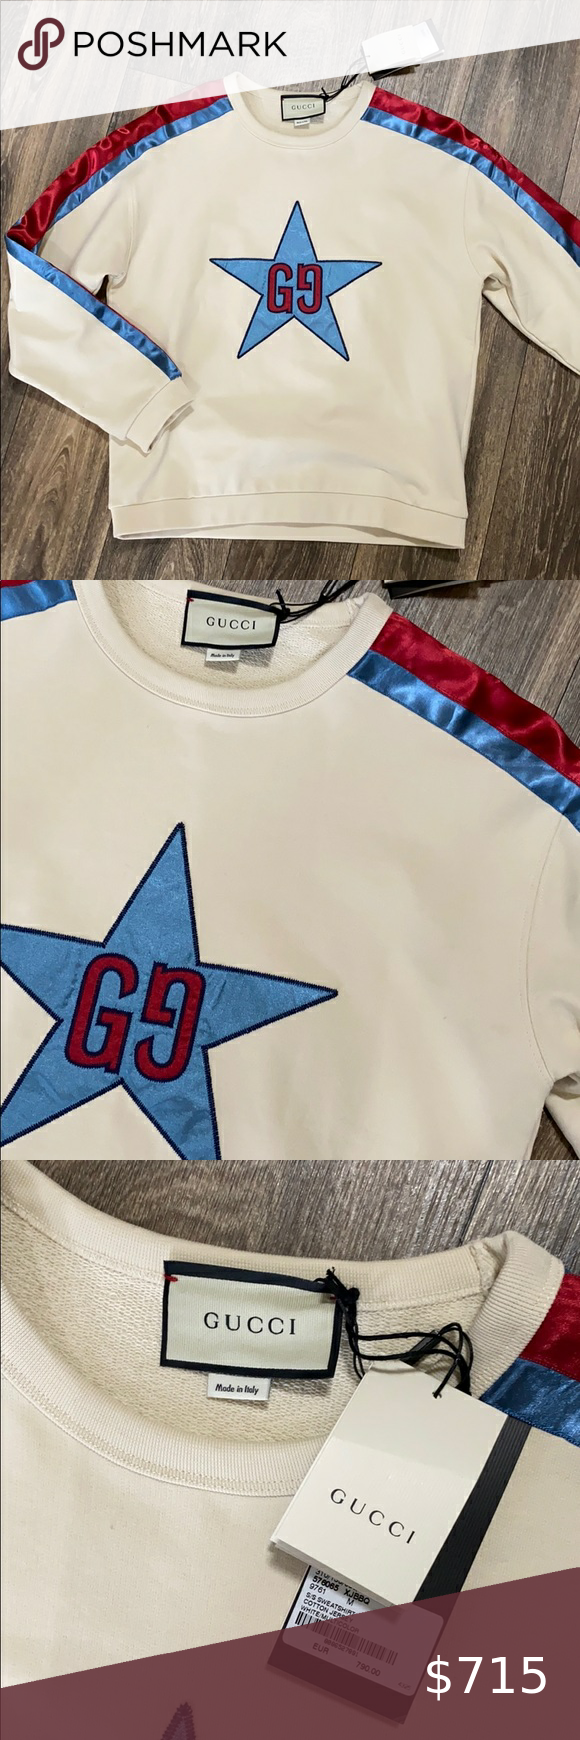 Authentic Gucci Crewneck Pullover Gucci Sweatshirt Cotton Sweatshirts Sweatshirts [ 1740 x 580 Pixel ]